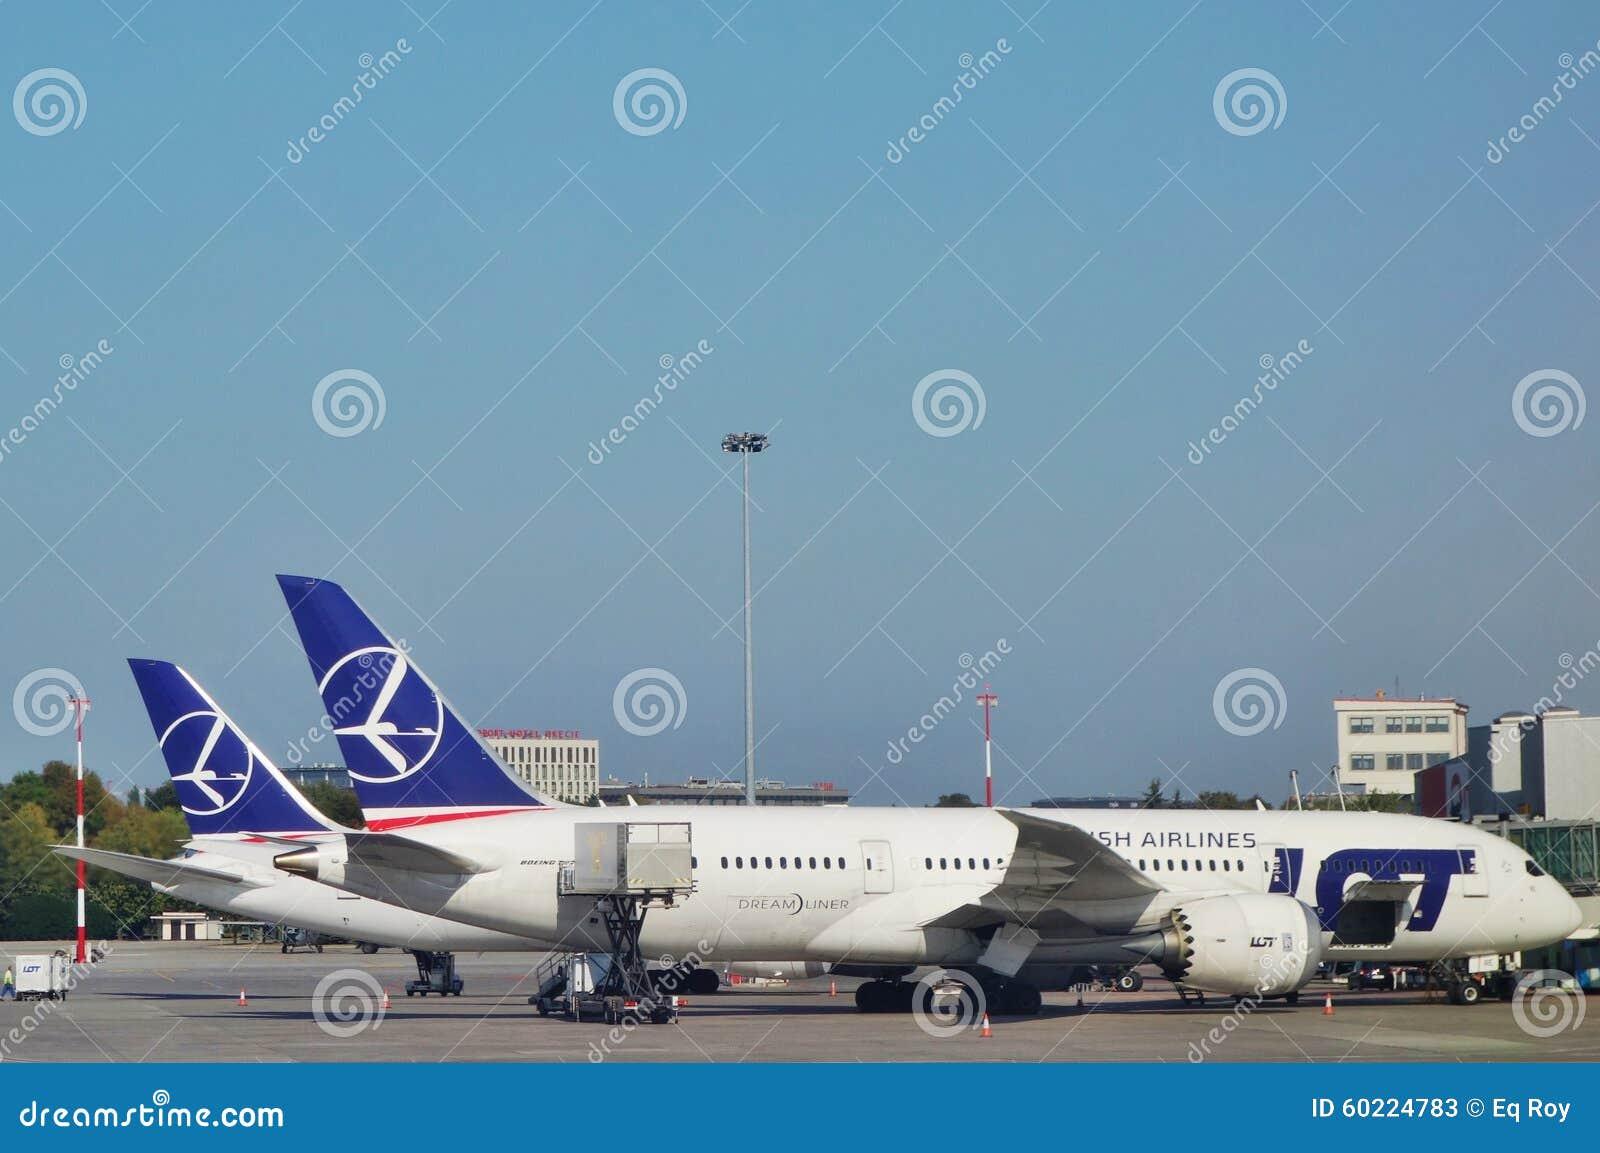 Aeroporto Waw : The warsaw chopin airport waw editorial stock photo image of